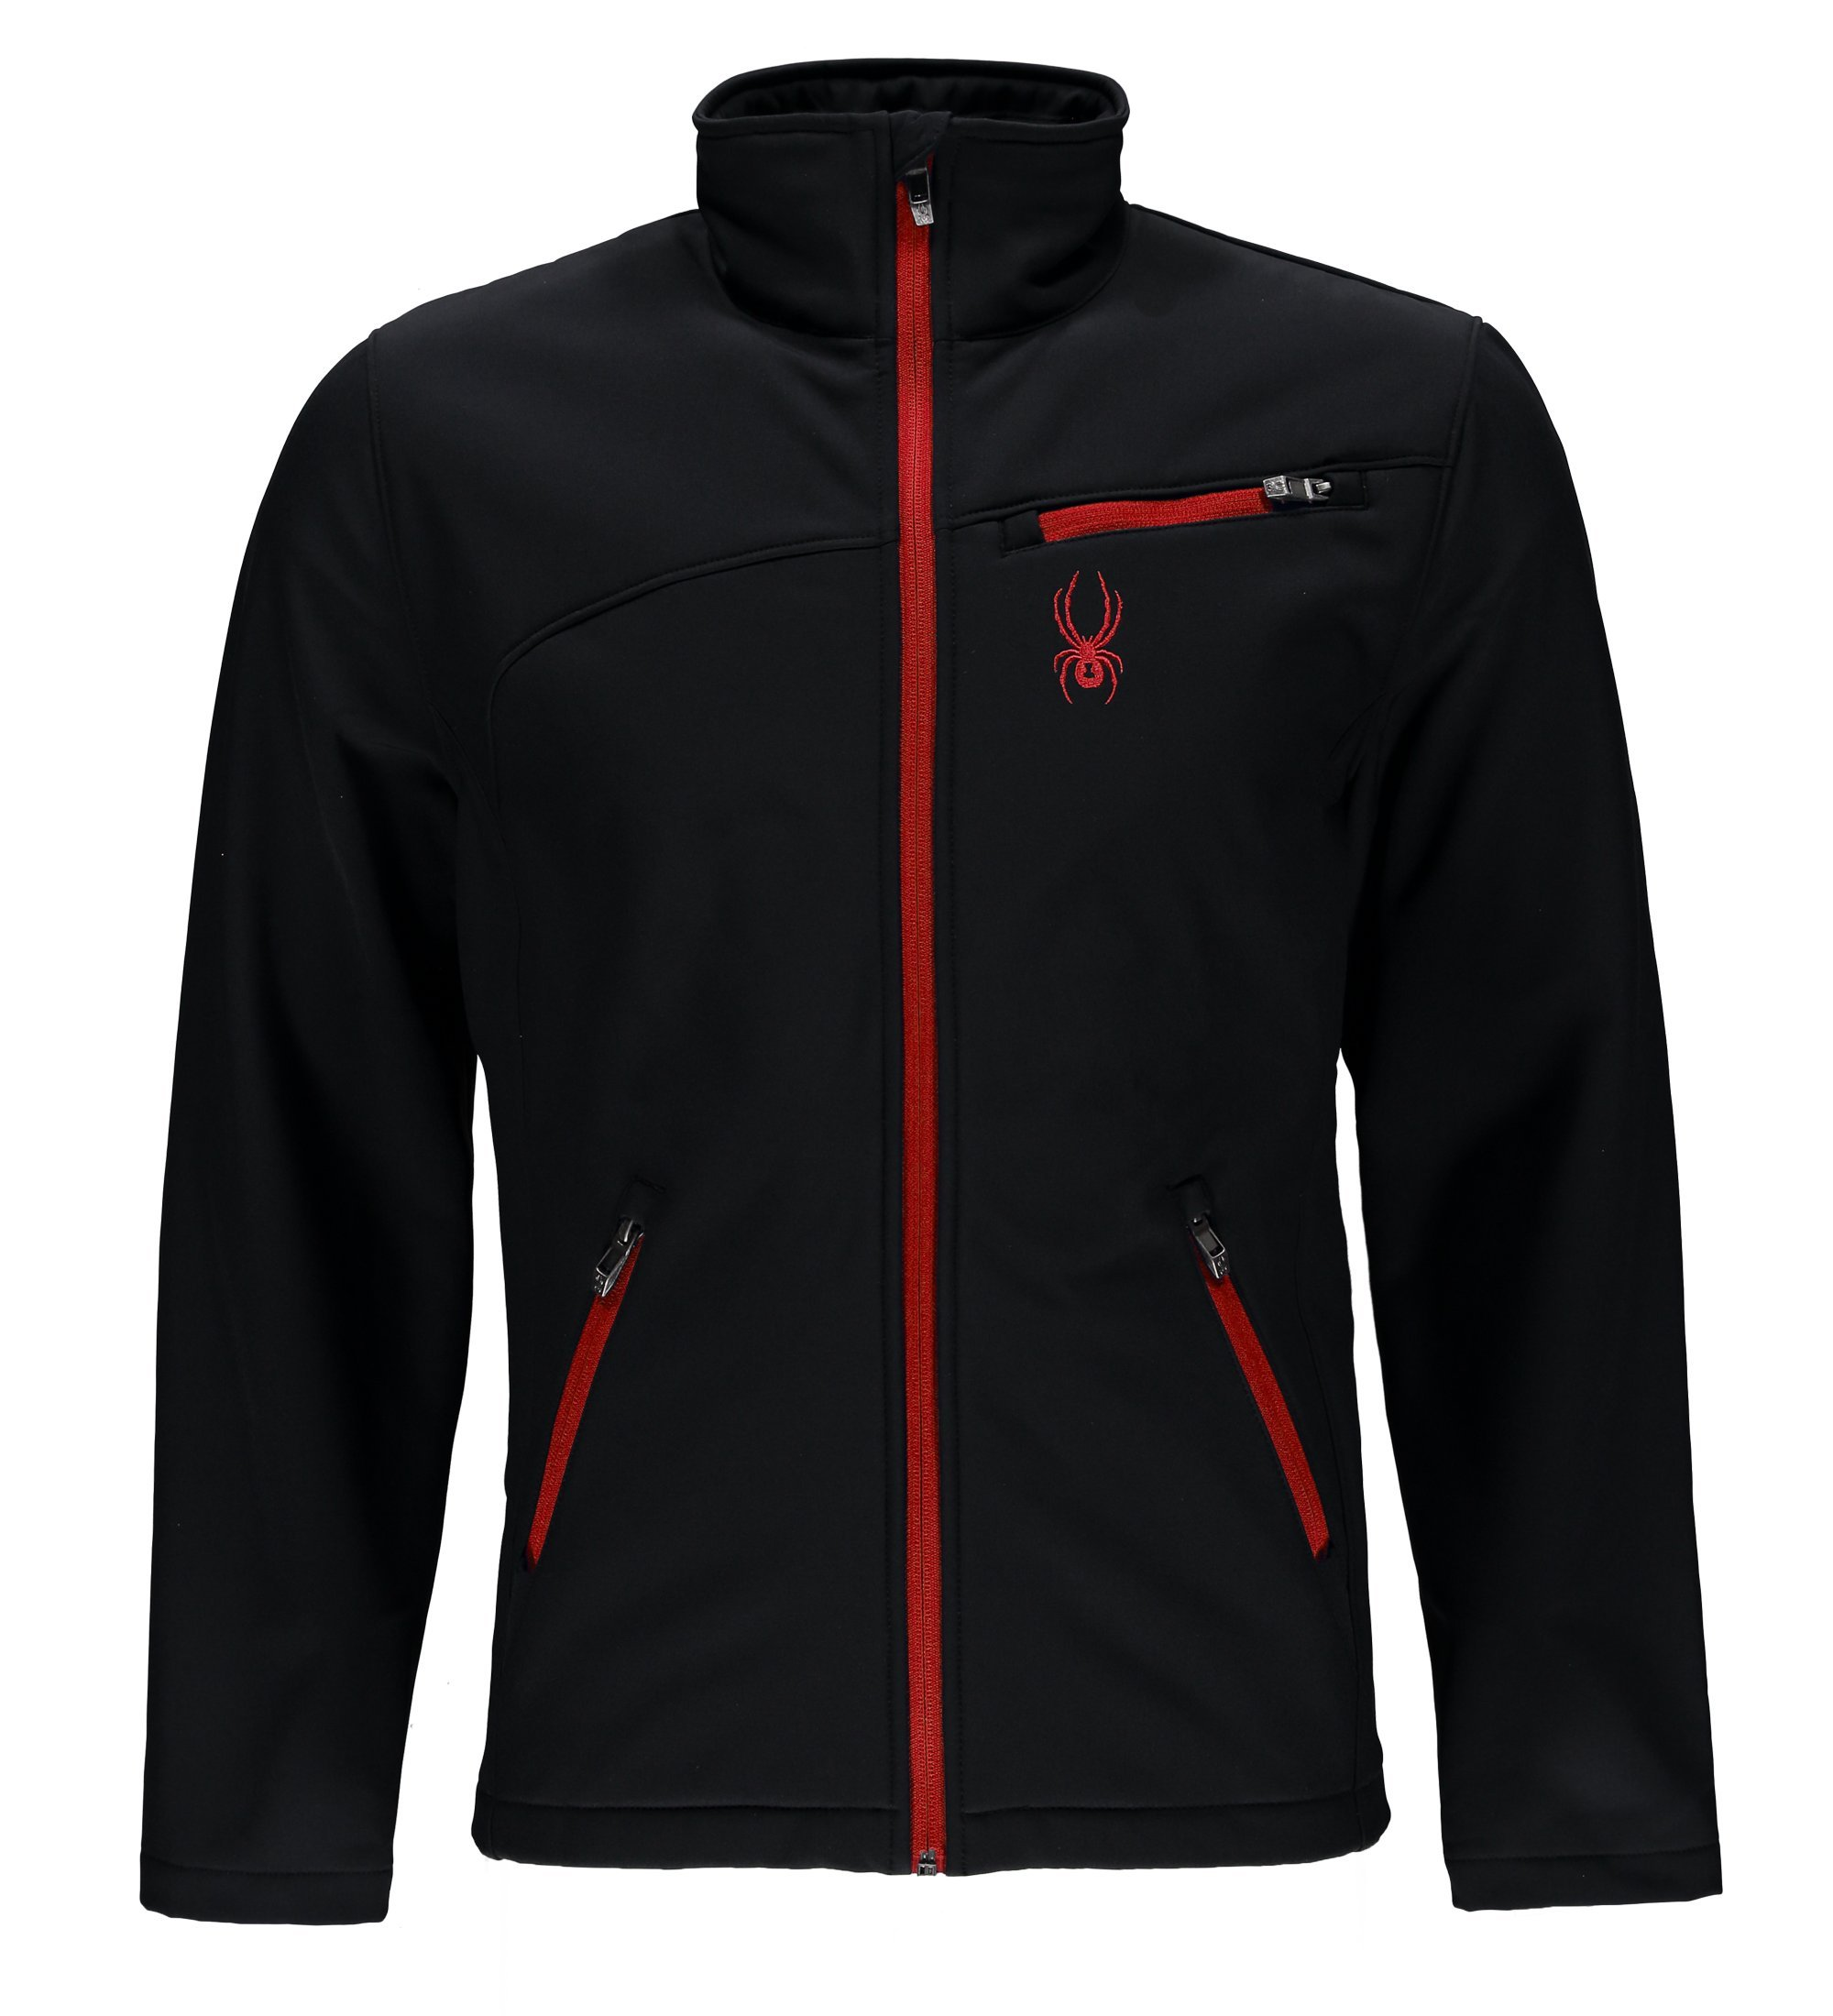 Spyder Men's Softshell Jacket, Black/Racing Red, X-Large by Spyder